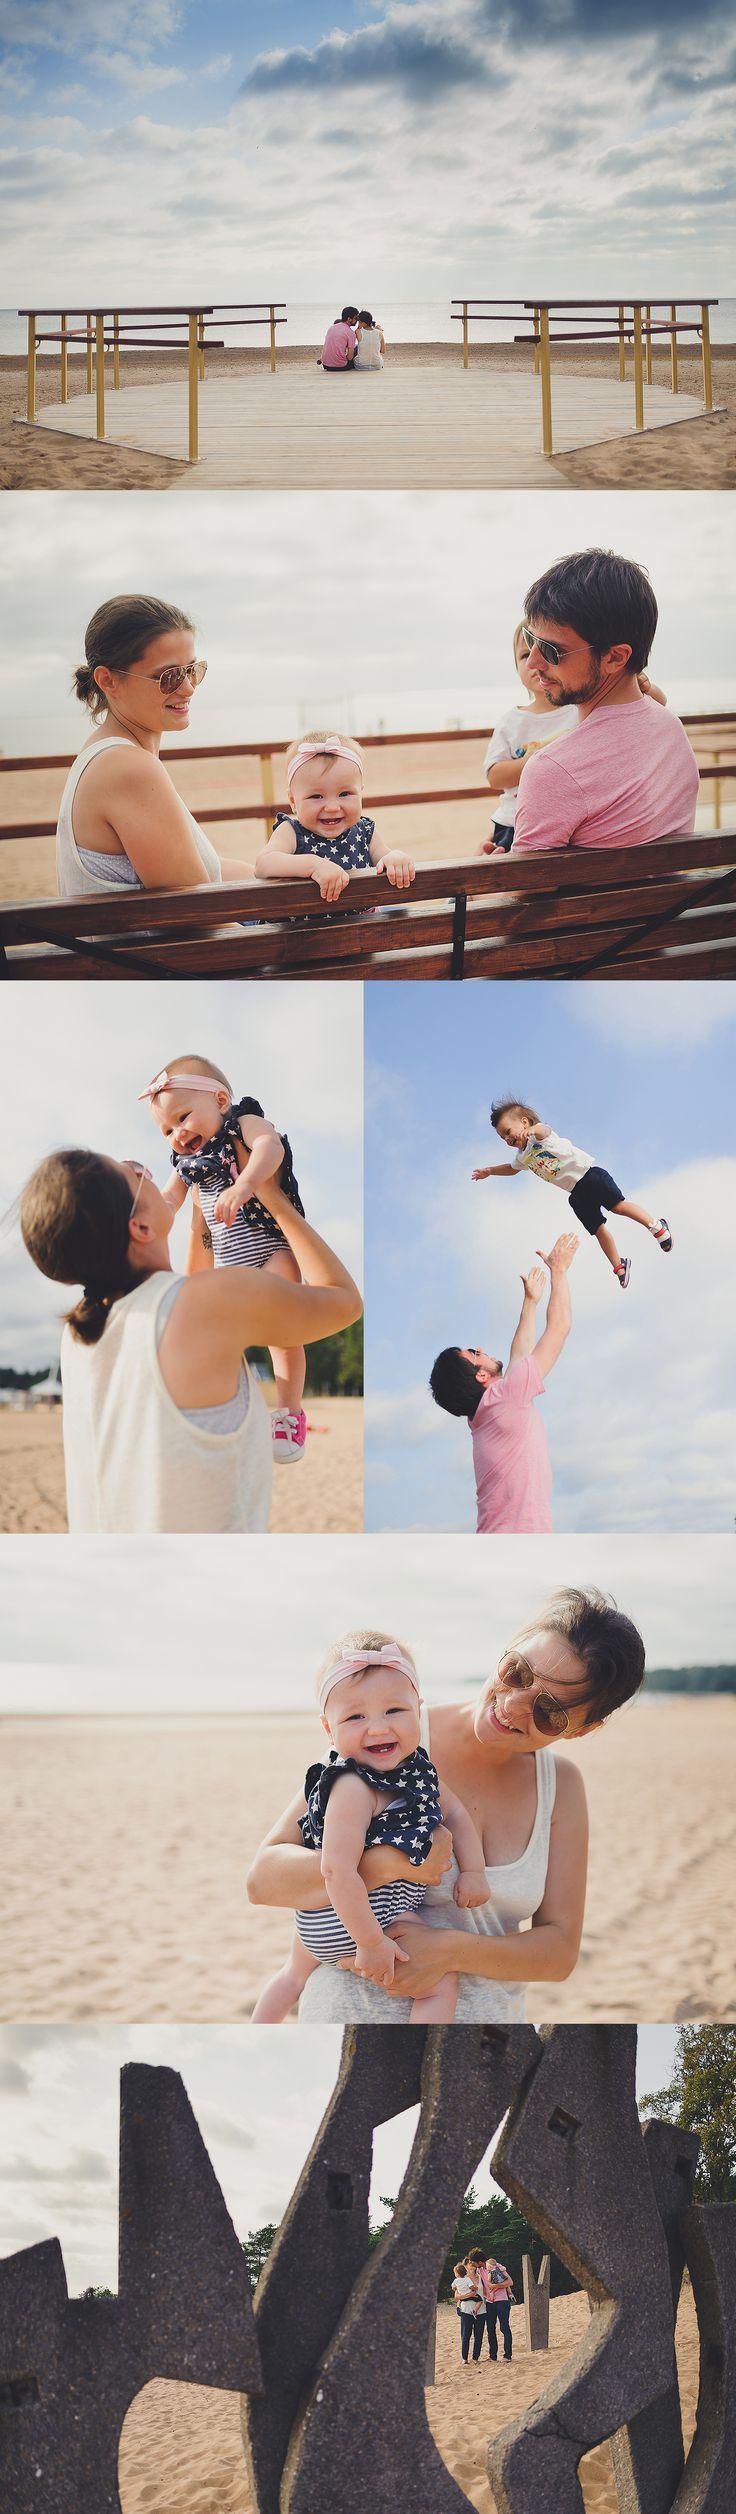 "Day on the Bay (family walk on the beach) / Серия ""День на заливе"" (семейная прогулка по пляжу)"